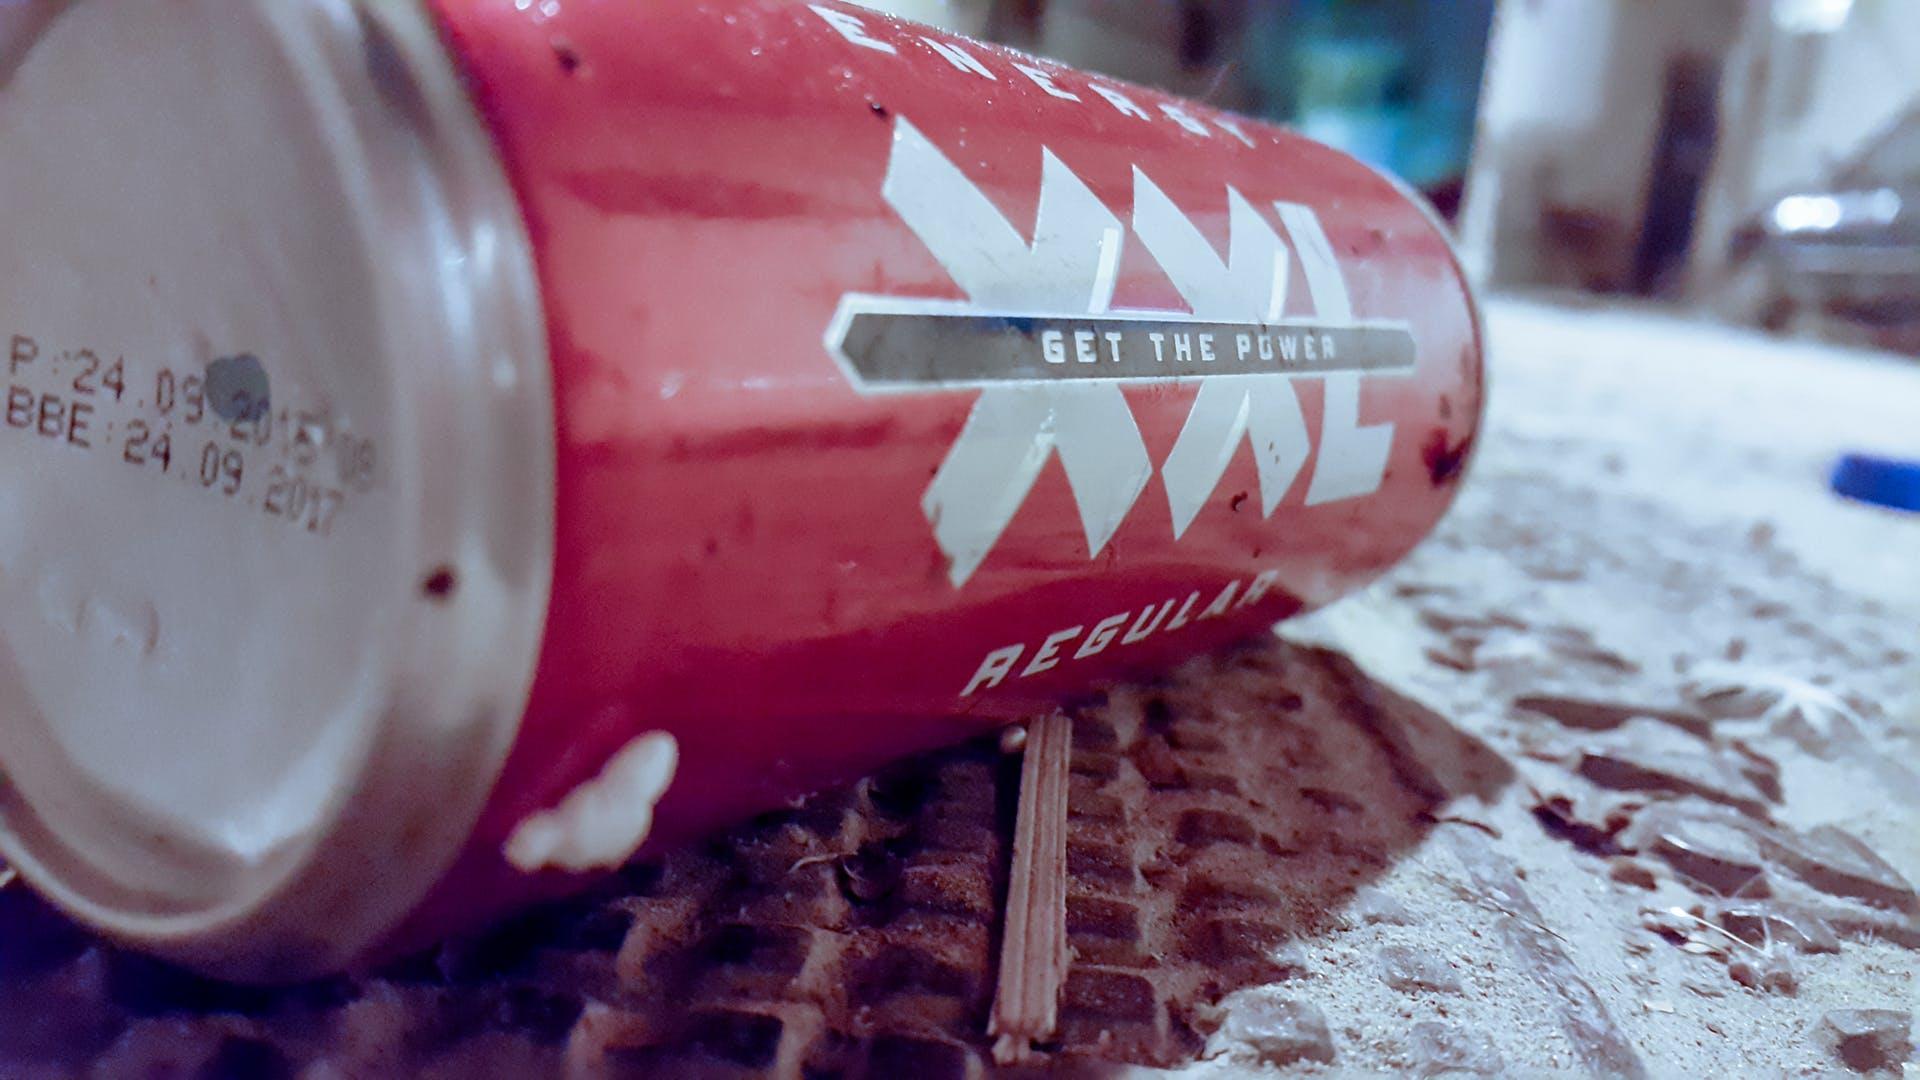 xxl red street drink ene energy blur